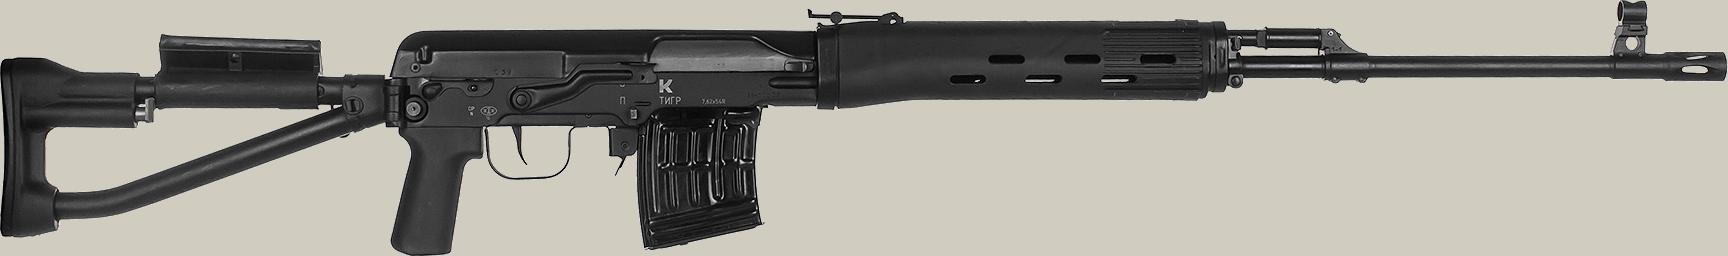 тигр исп 02,снайперская винтовка